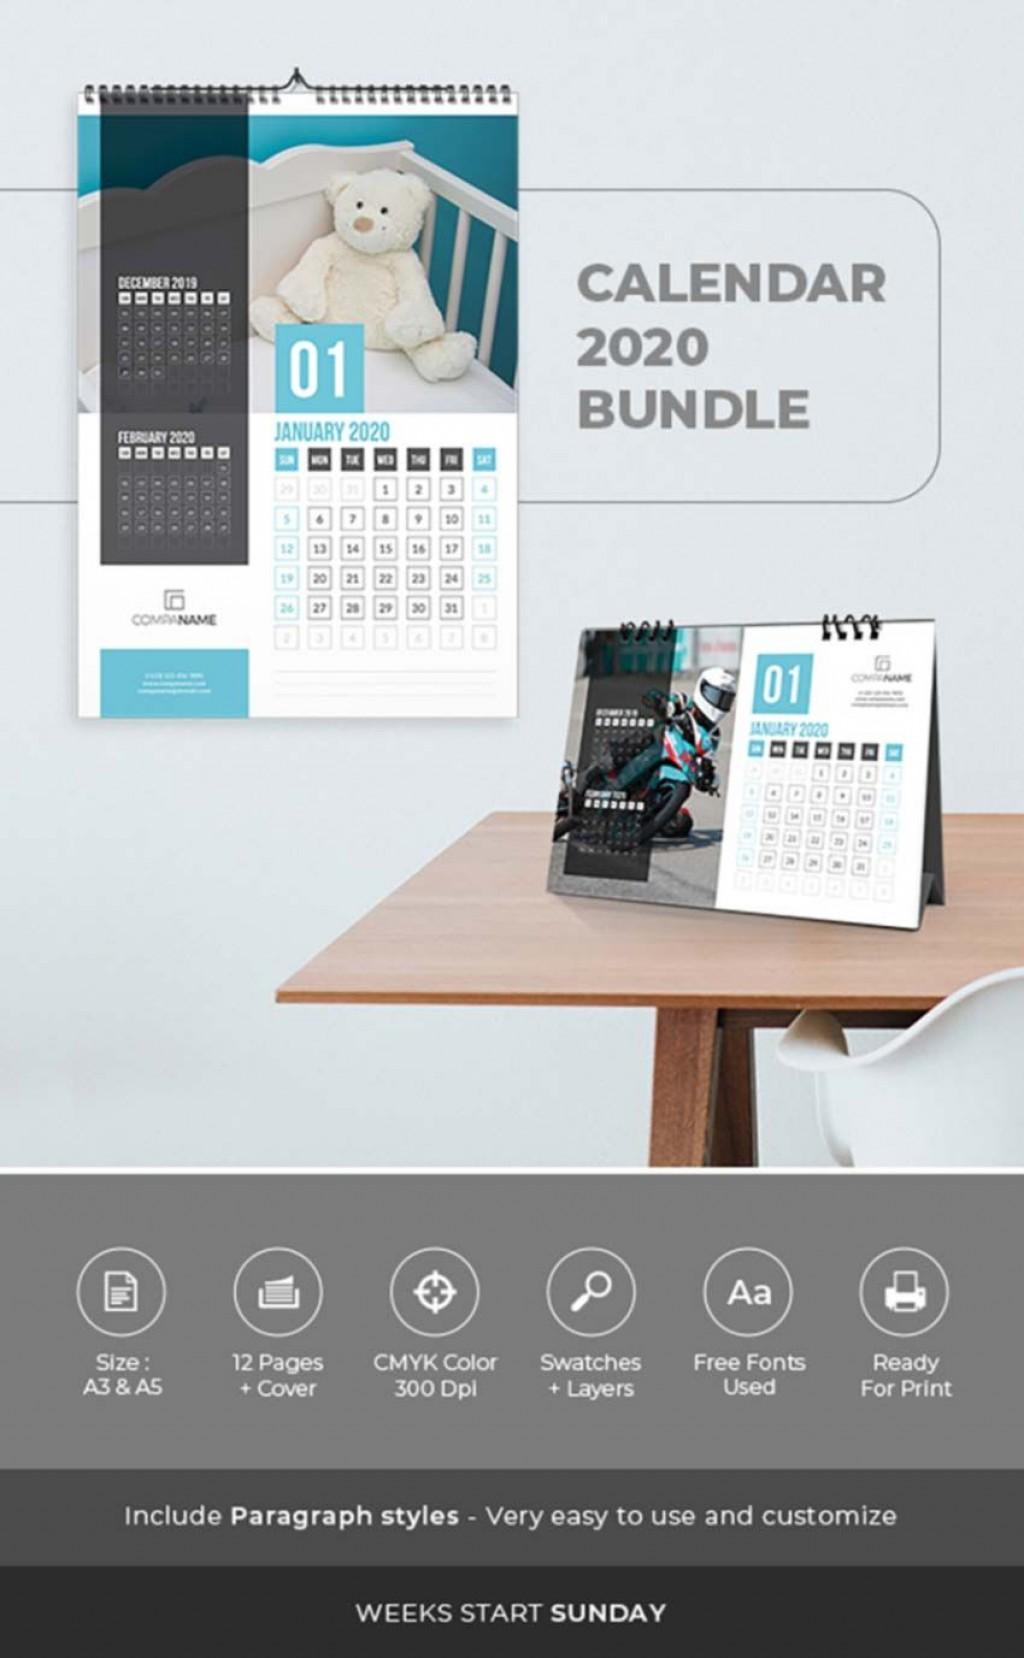 005 Shocking 2020 Calendar Template Indesign High Def  Adobe FreeLarge